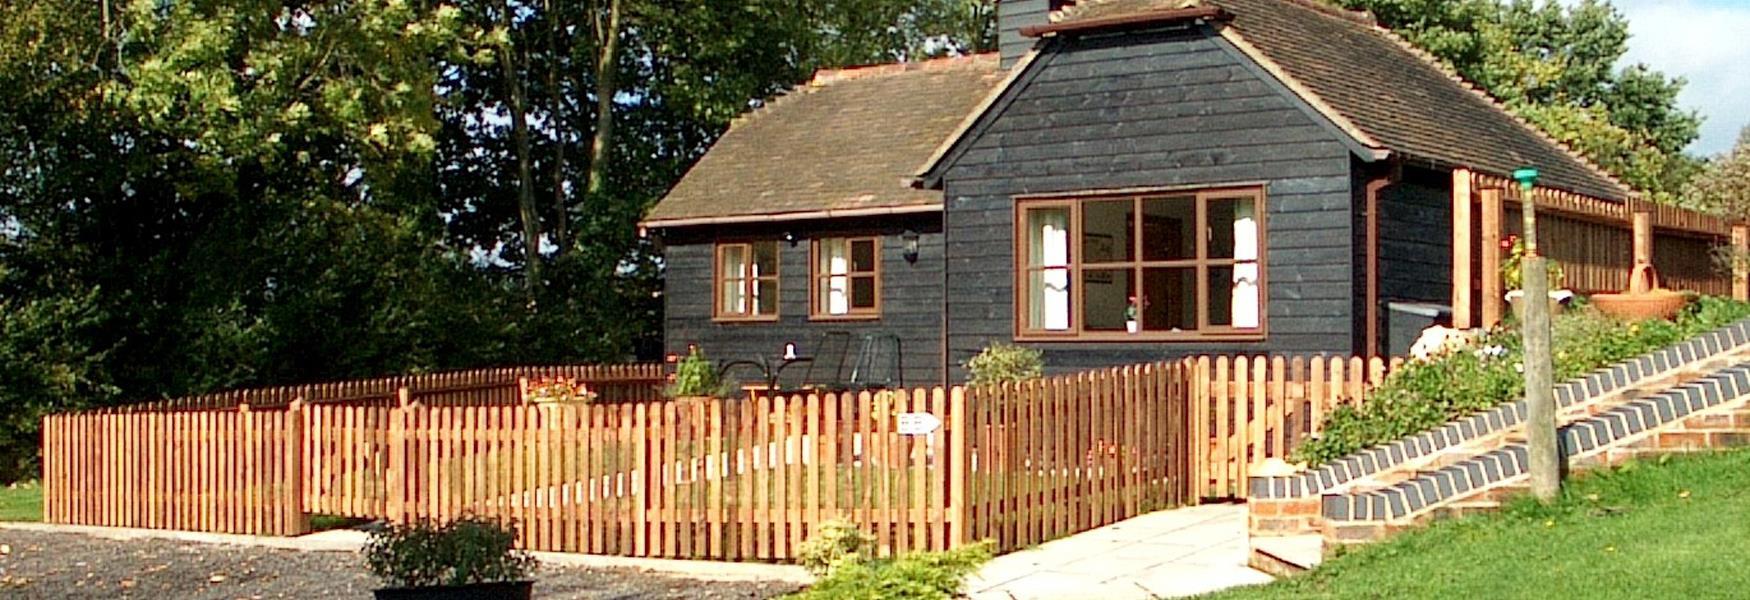 Apple Pye Cottage